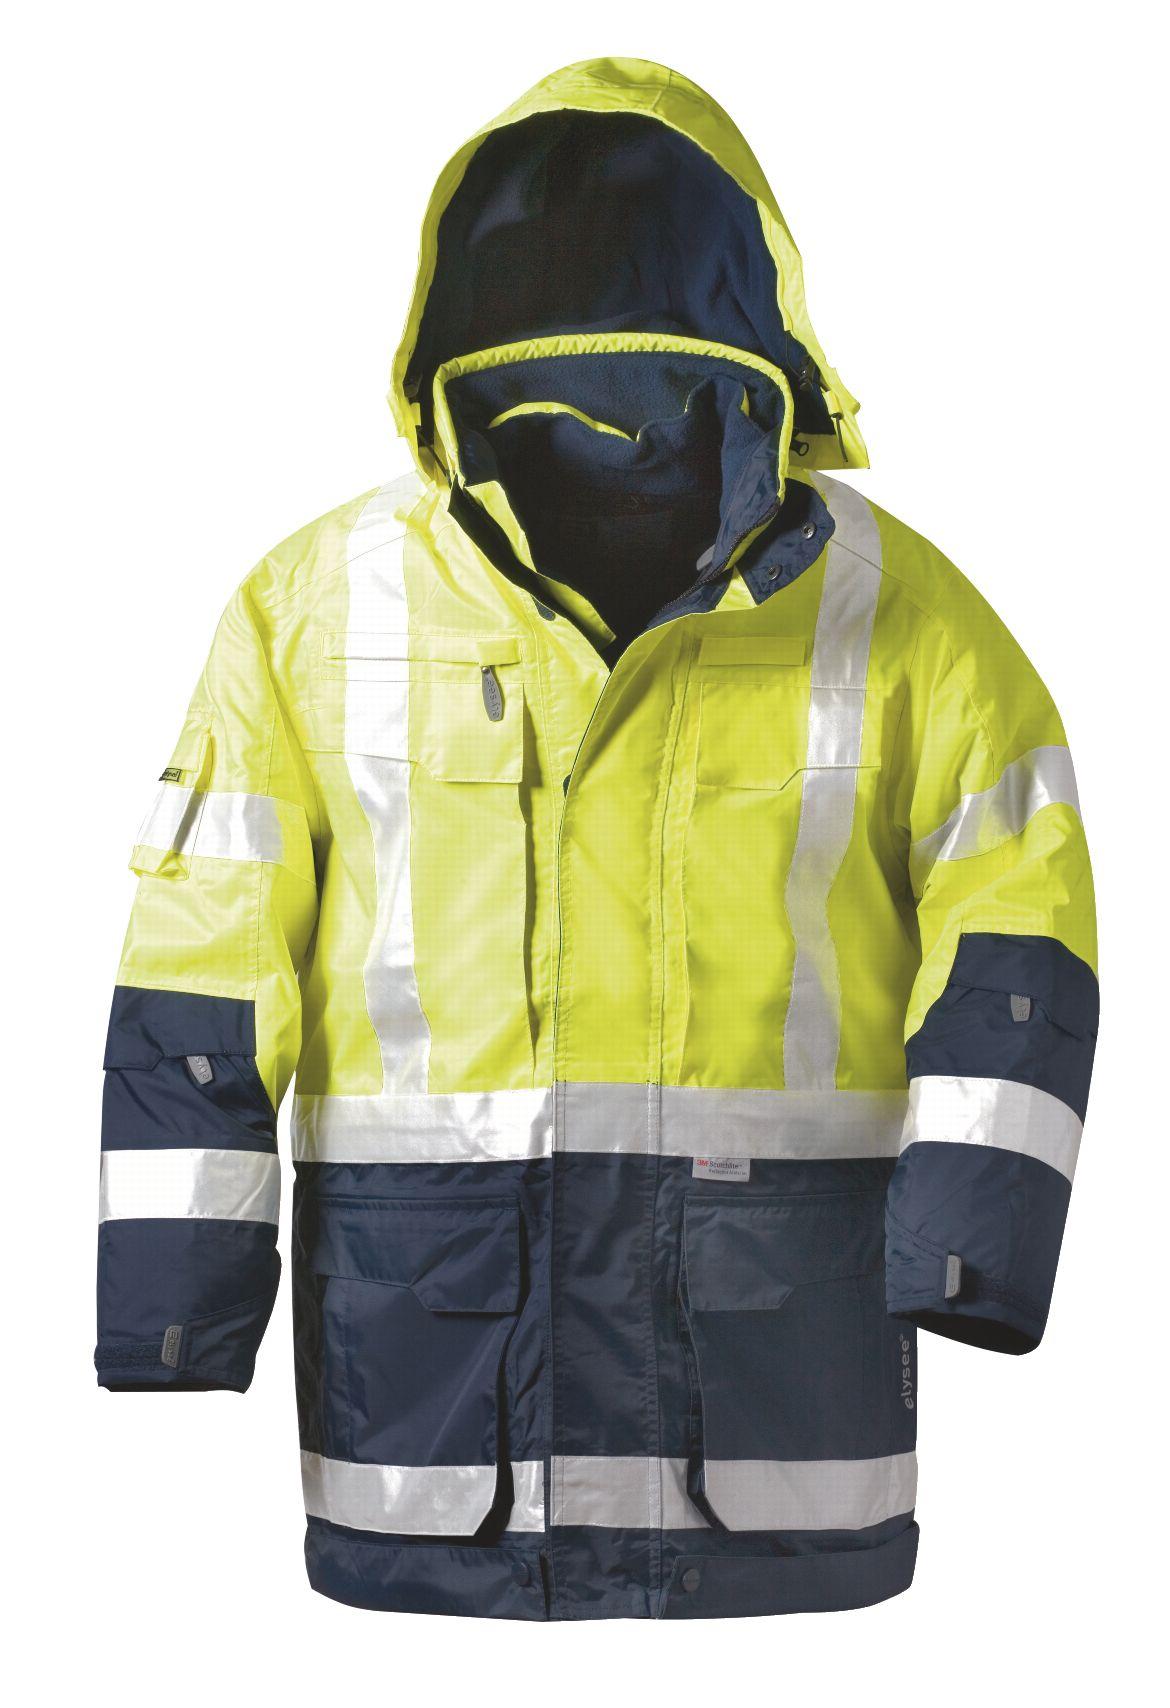 Warnschutz-Parka EN ISO 20471 Klasse 3, fluorgelb/marine